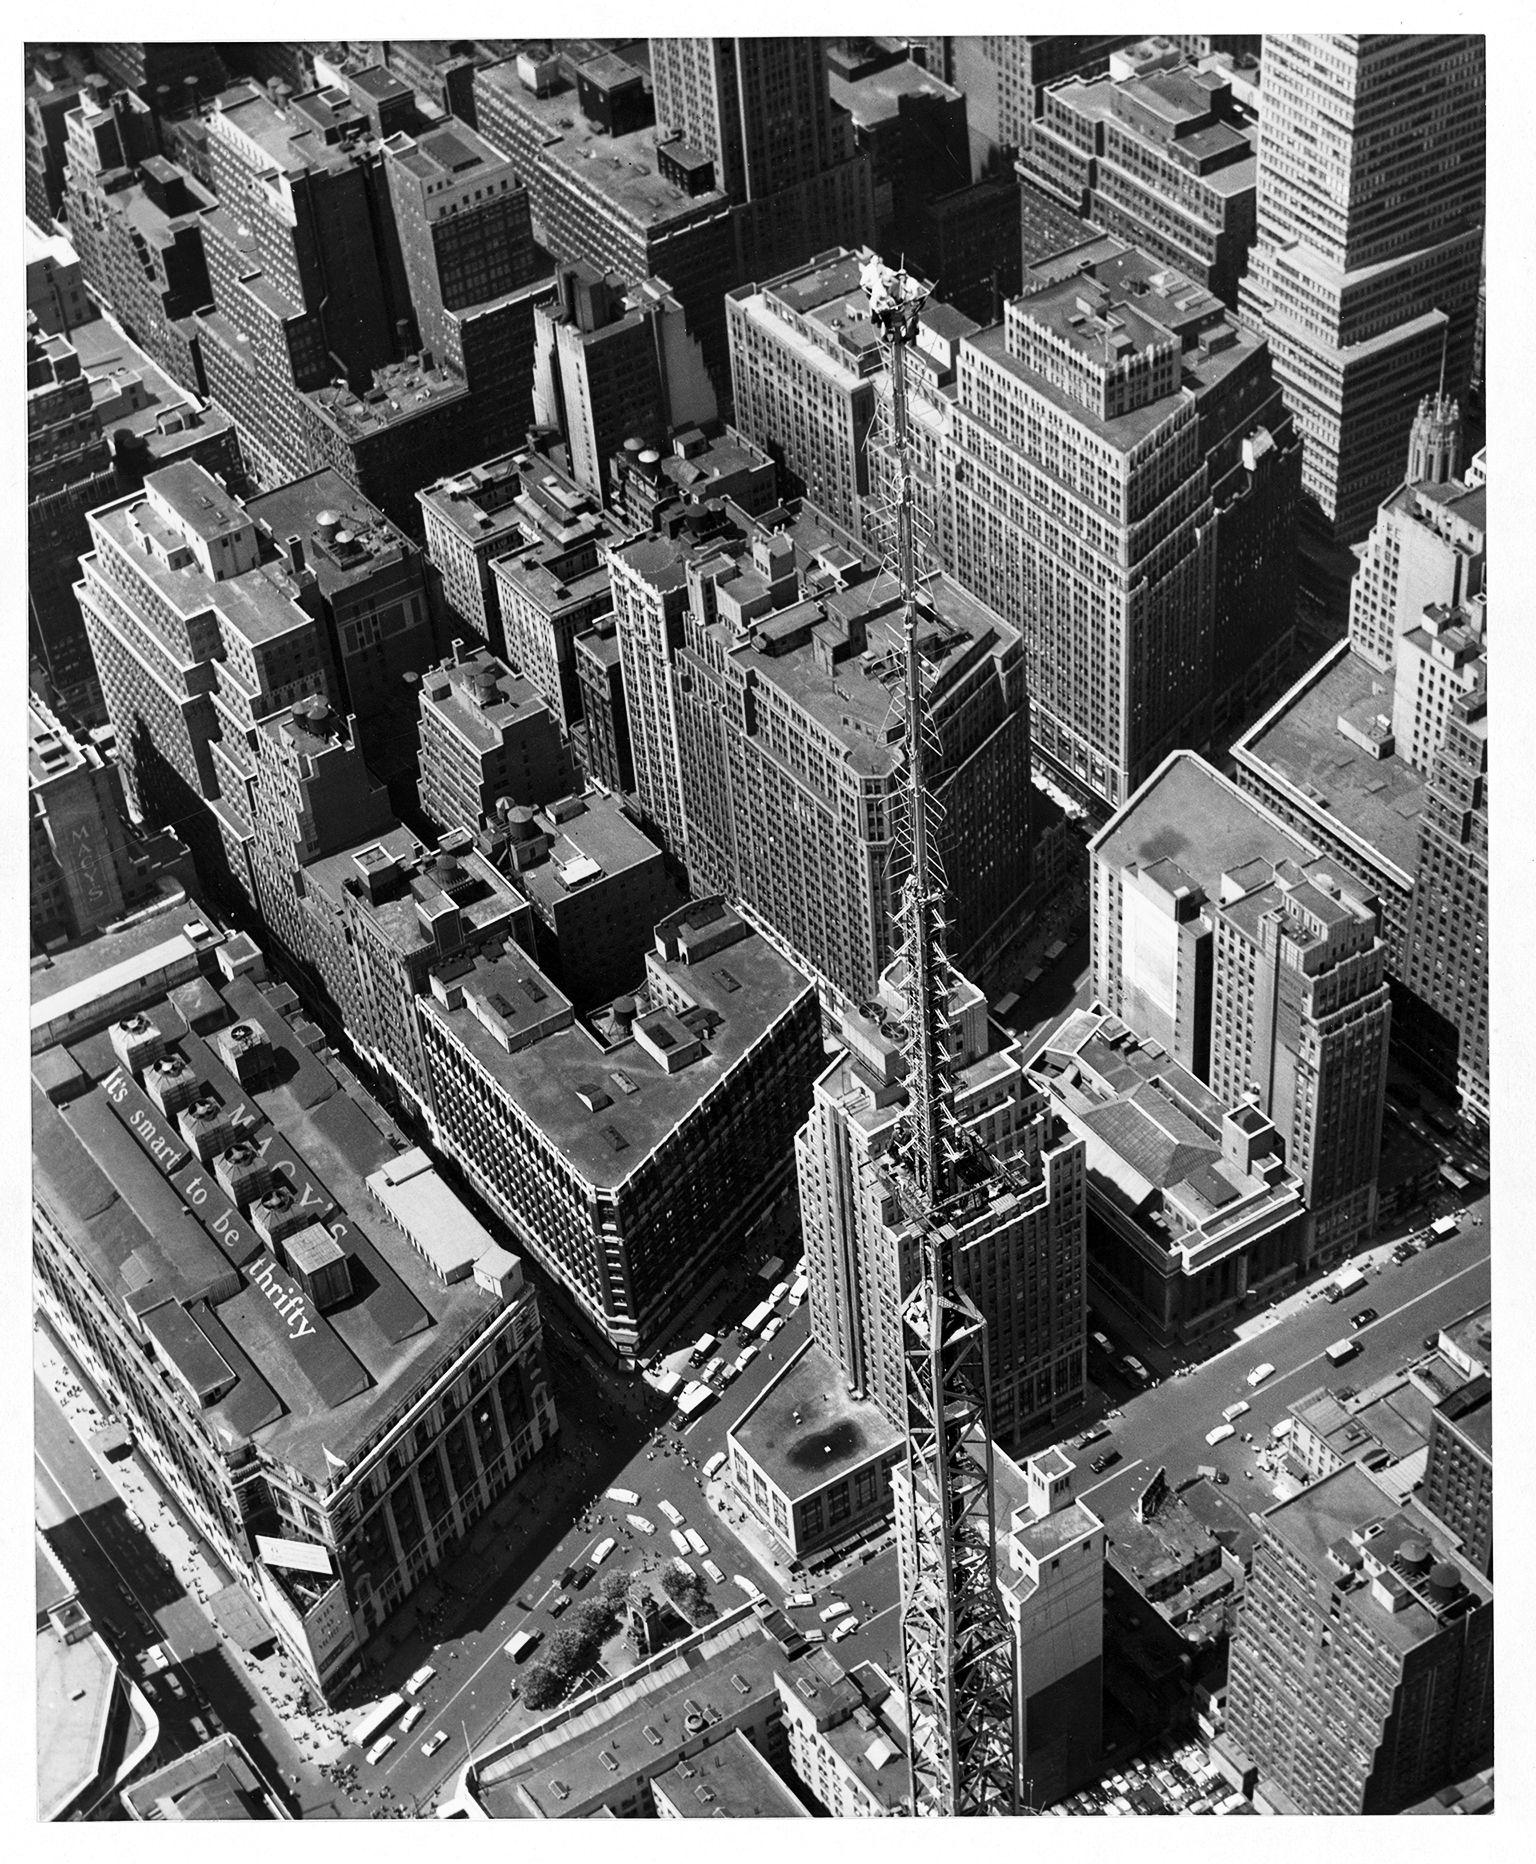 PHOTO: PUBLICITY ASSOCIATES, NEW YORK CITY/NATIONAL GEOGRAPHIC CREATIVE